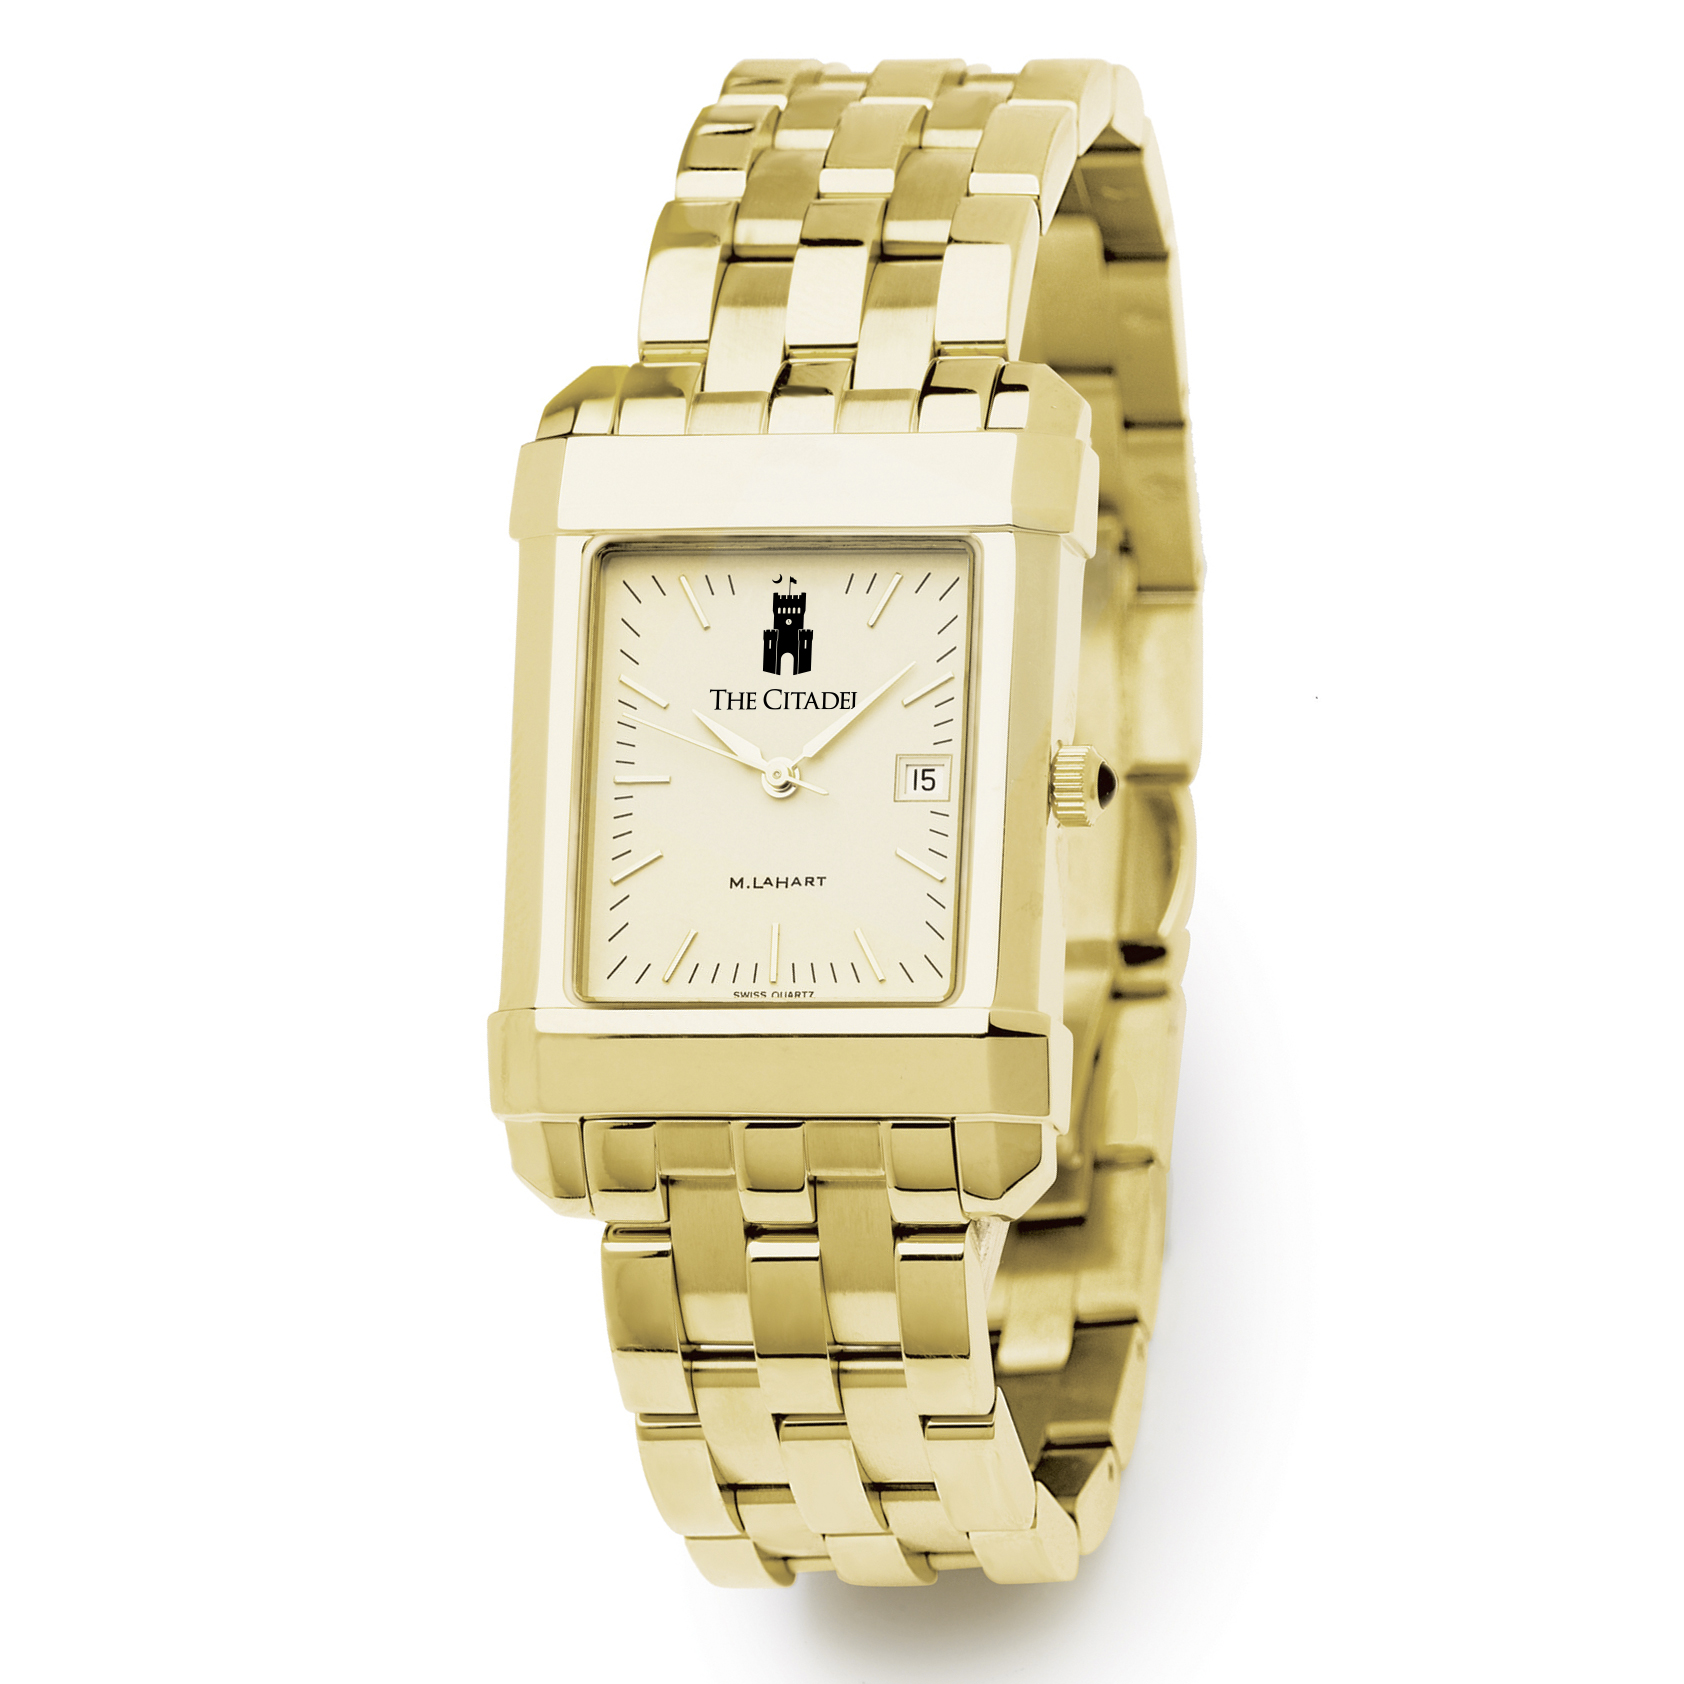 Citadel Men's Gold Quad Watch with Bracelet - Image 2